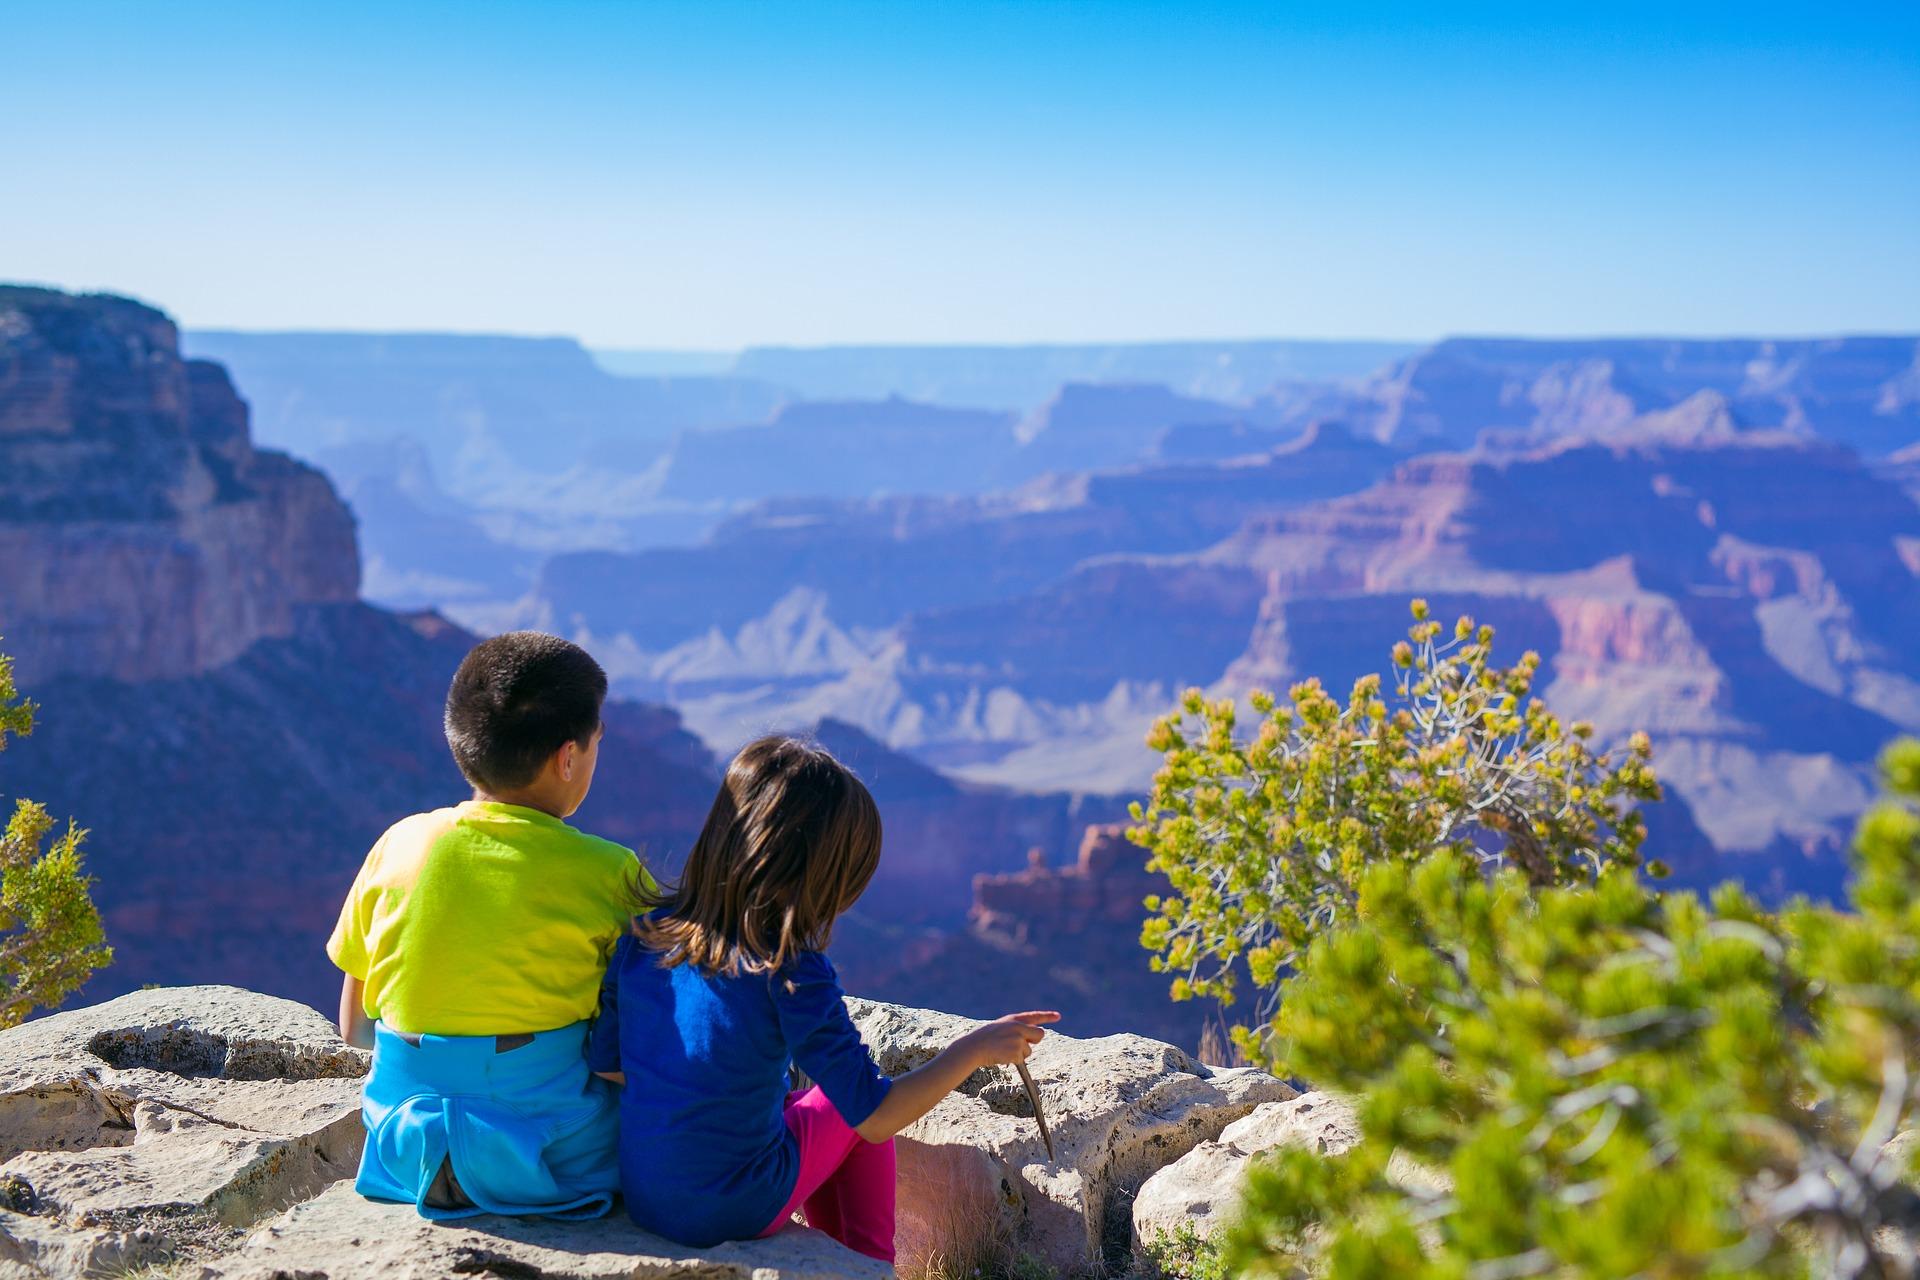 grand-canyon-vacation-with-kids-courtesy-pixabay